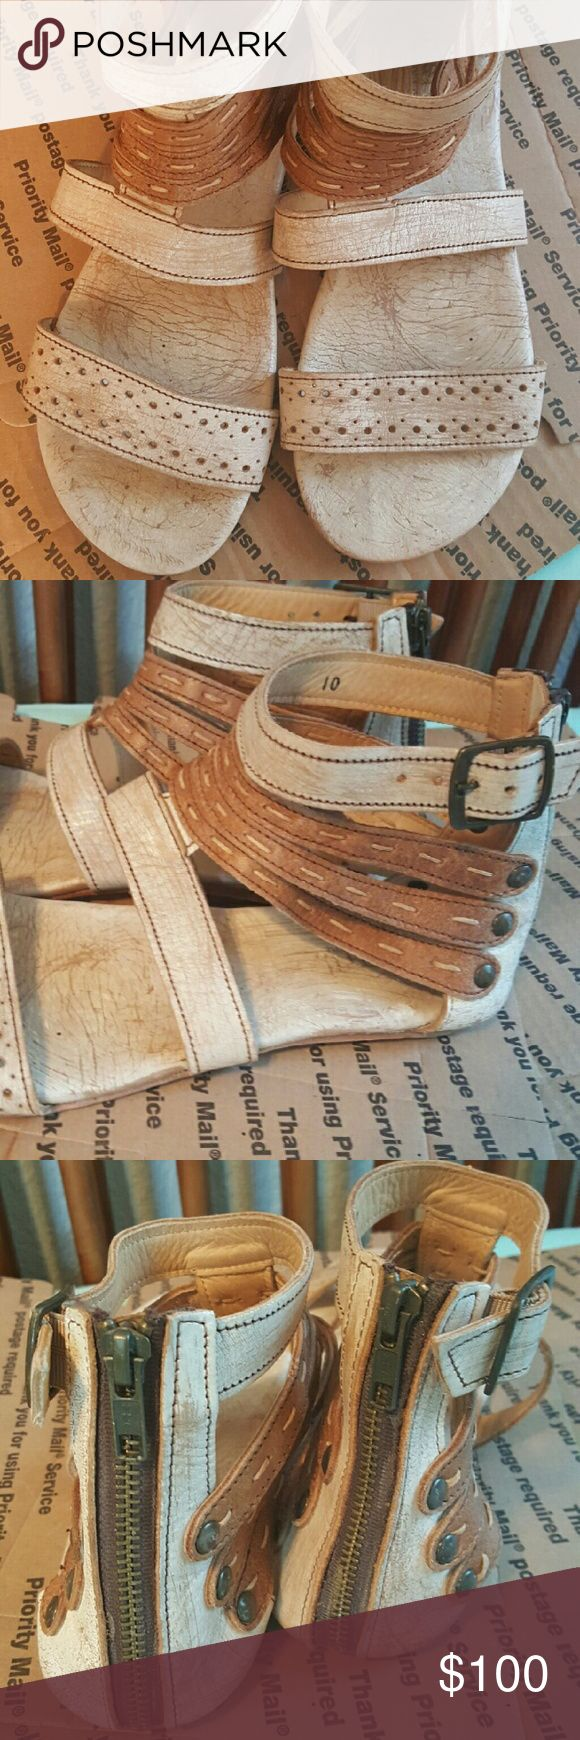 Bed Stu genuine leather sandals Size 10. Excellent condition! Bed Stu Shoes Sandals